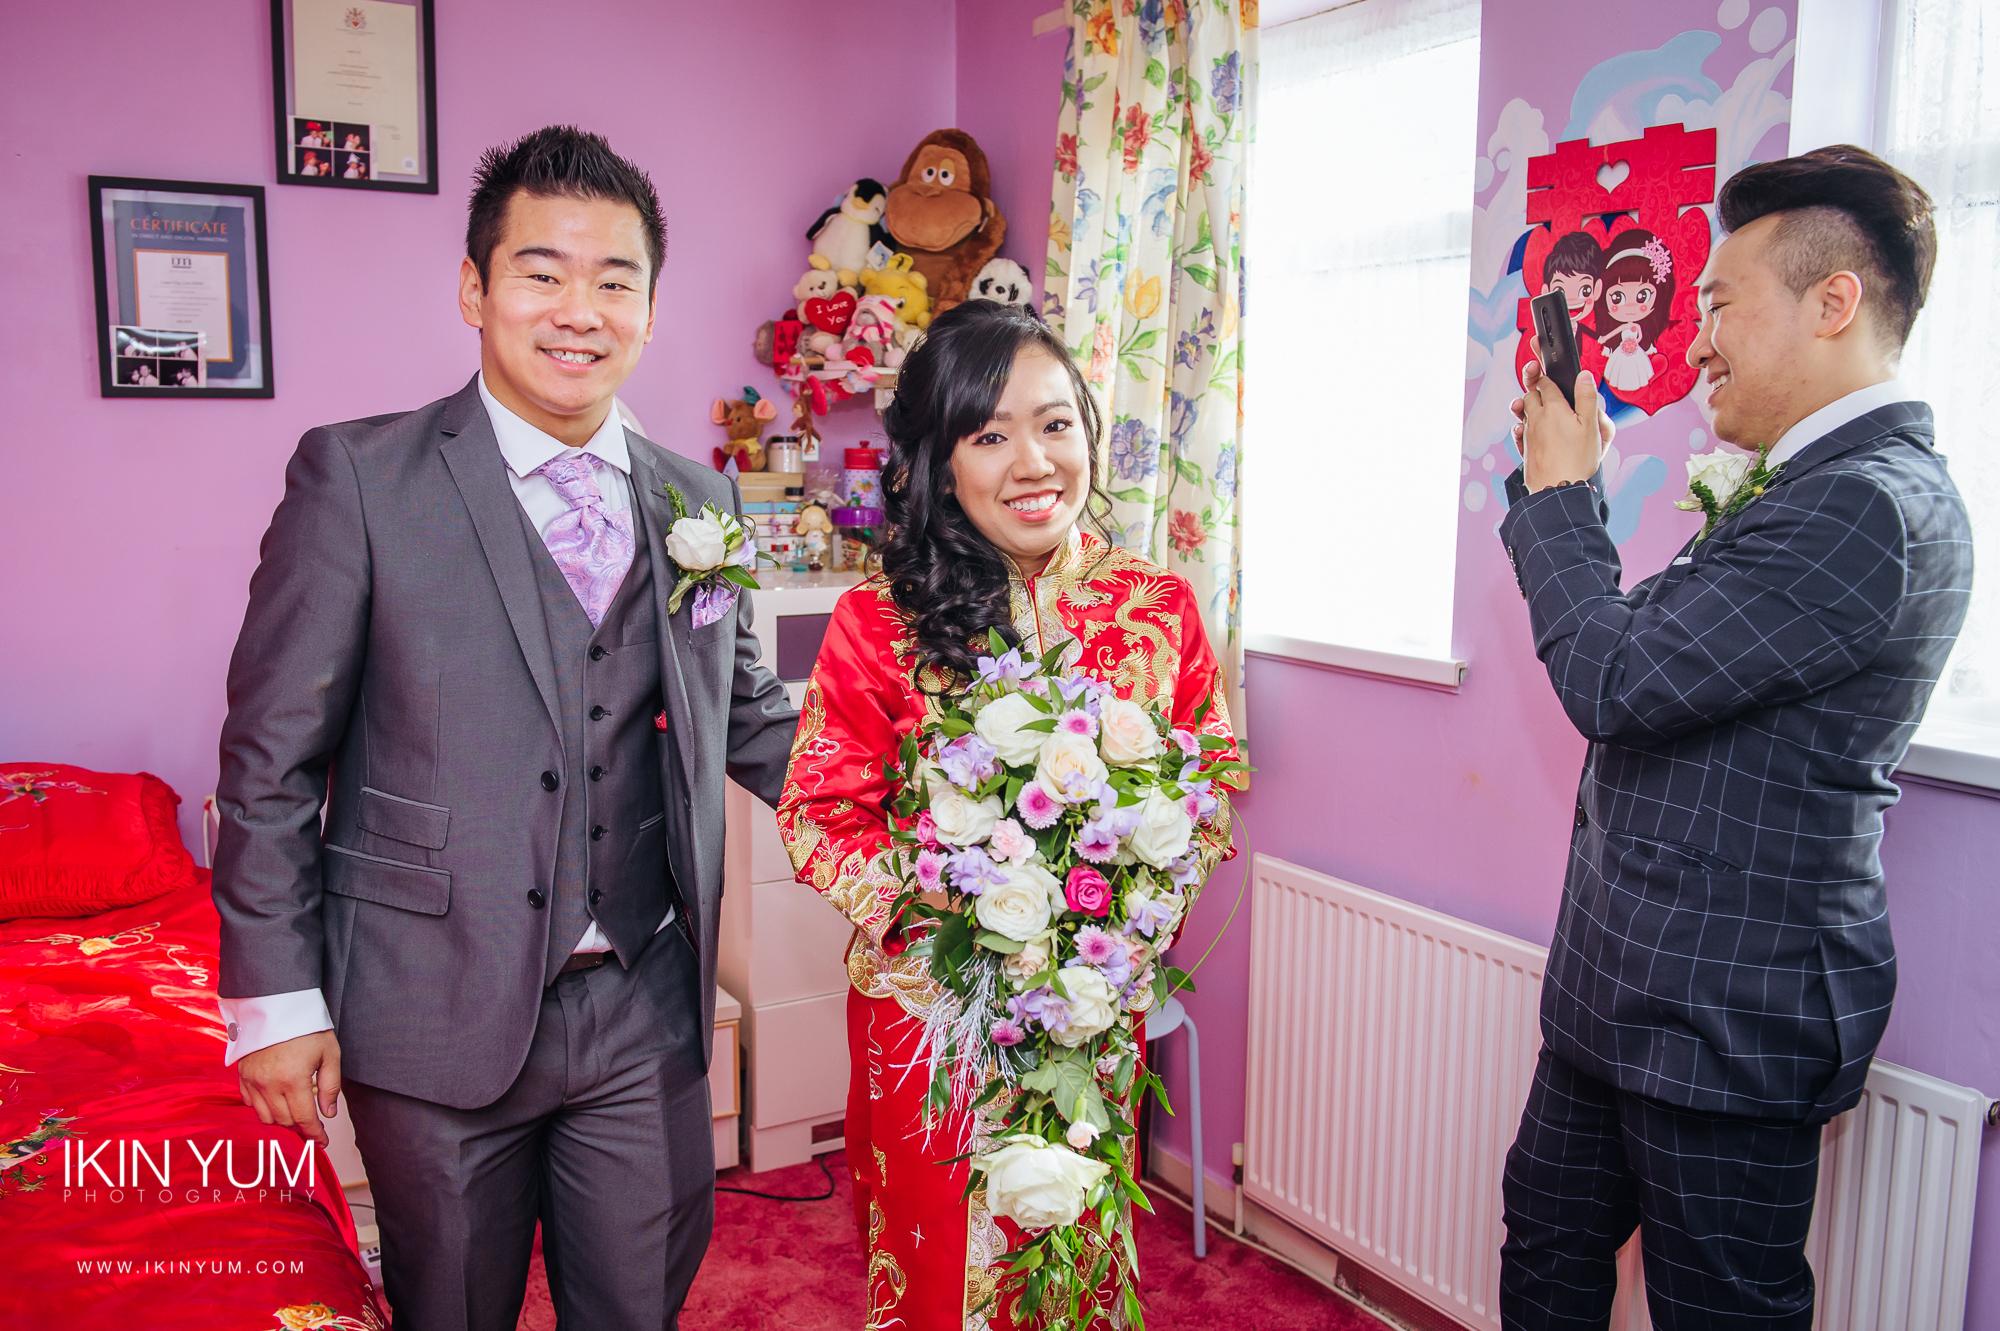 Hampton Manor Wedding - Ikin Yum Photography -033.jpg